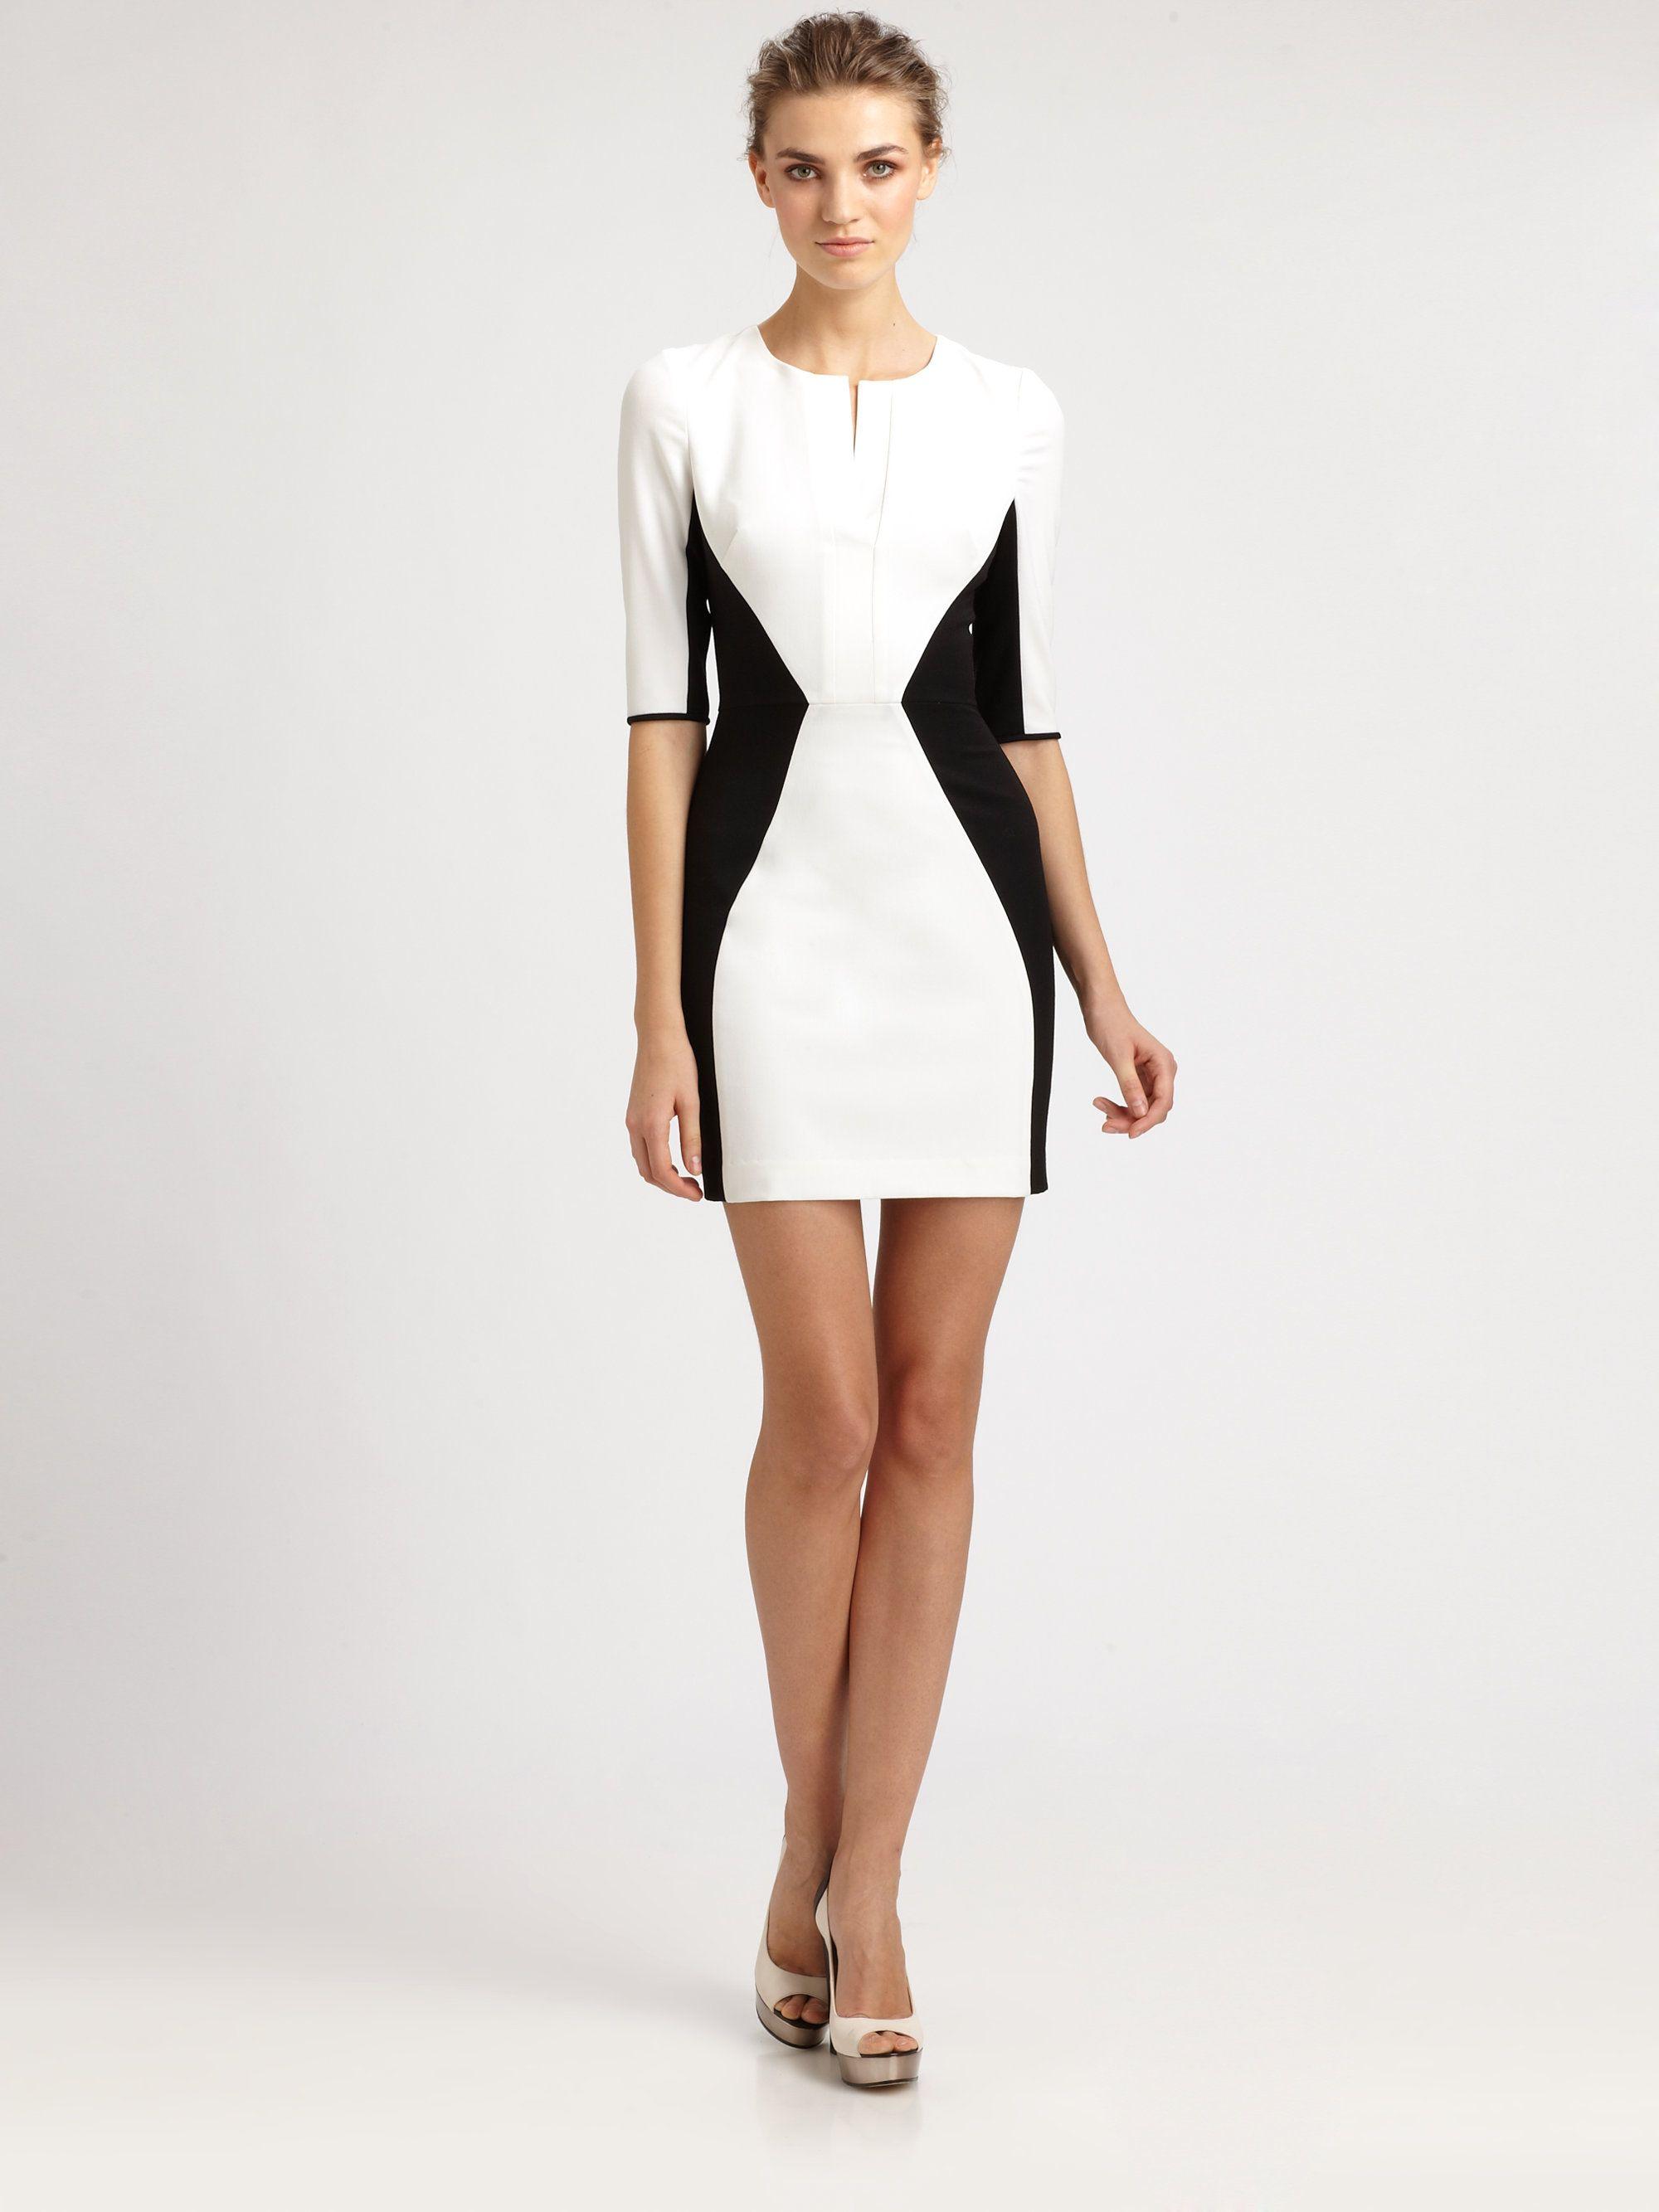 Black white colorblock dress